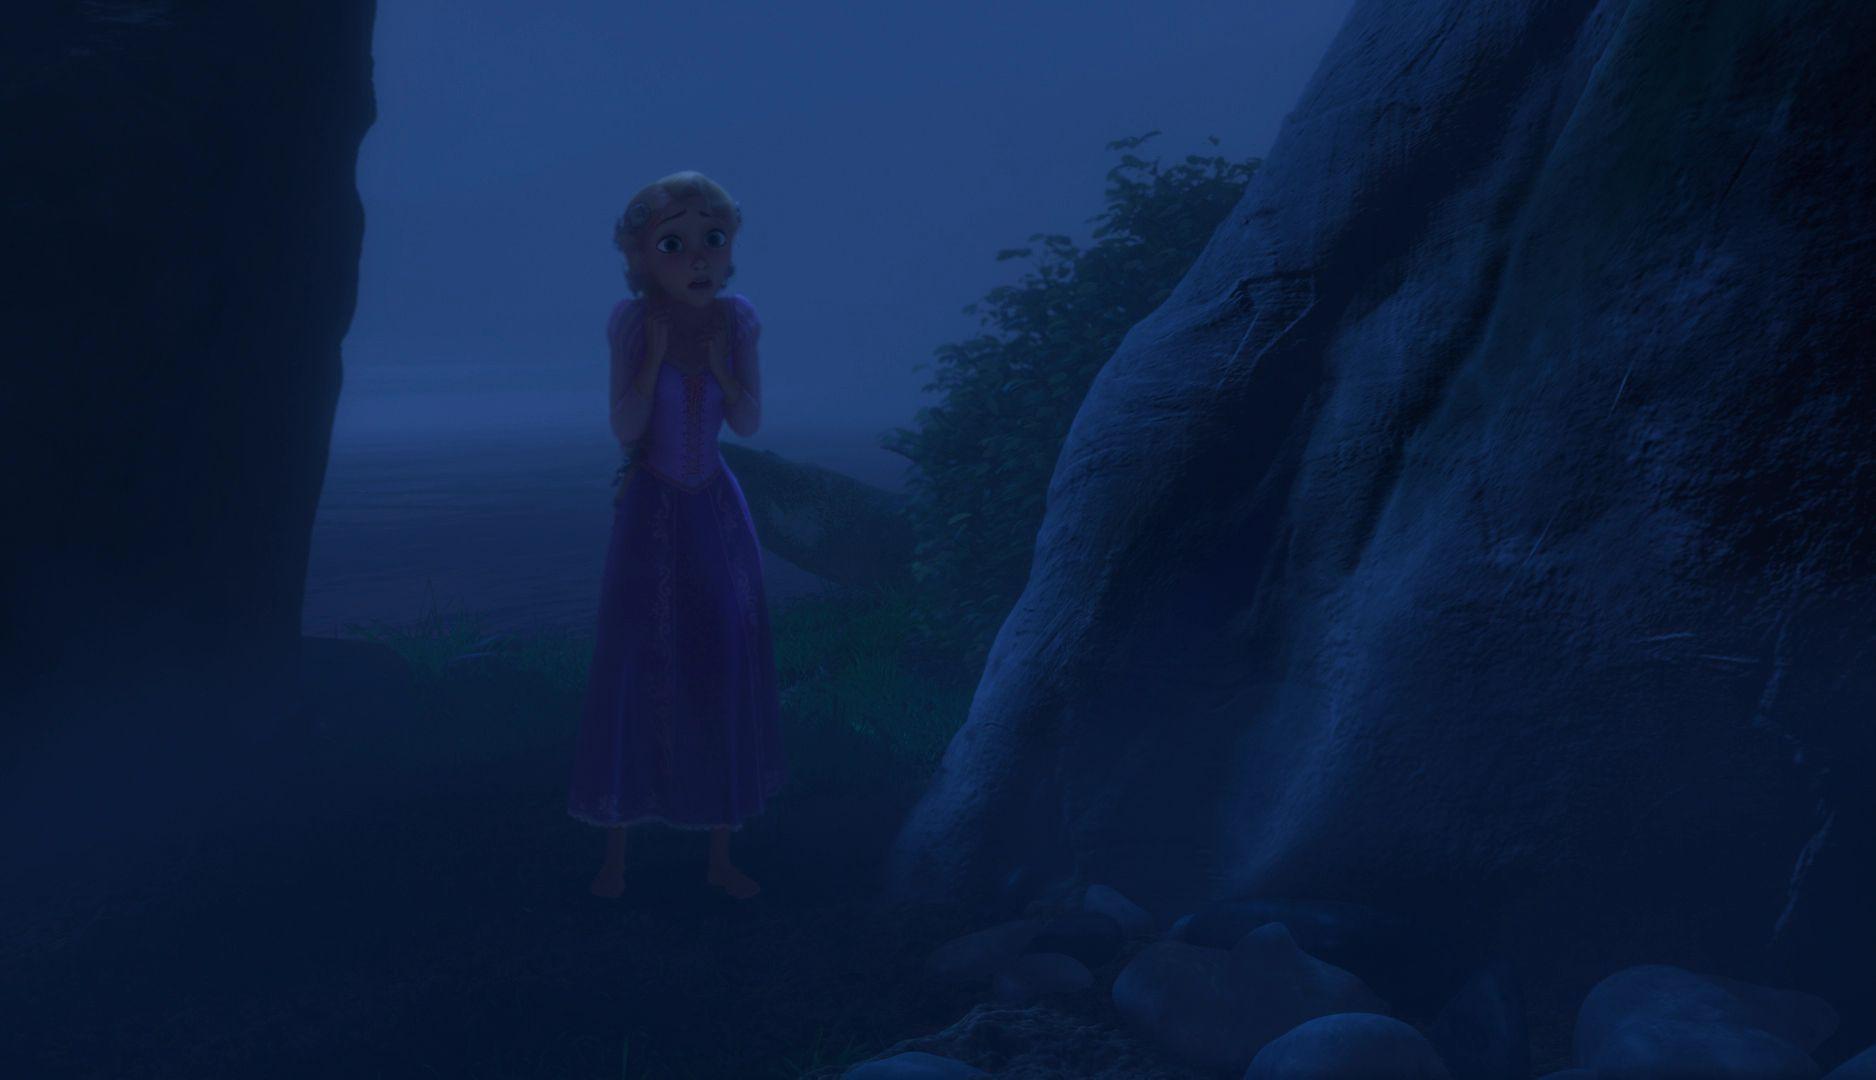 Tangled: Full Movie [Screencaps]